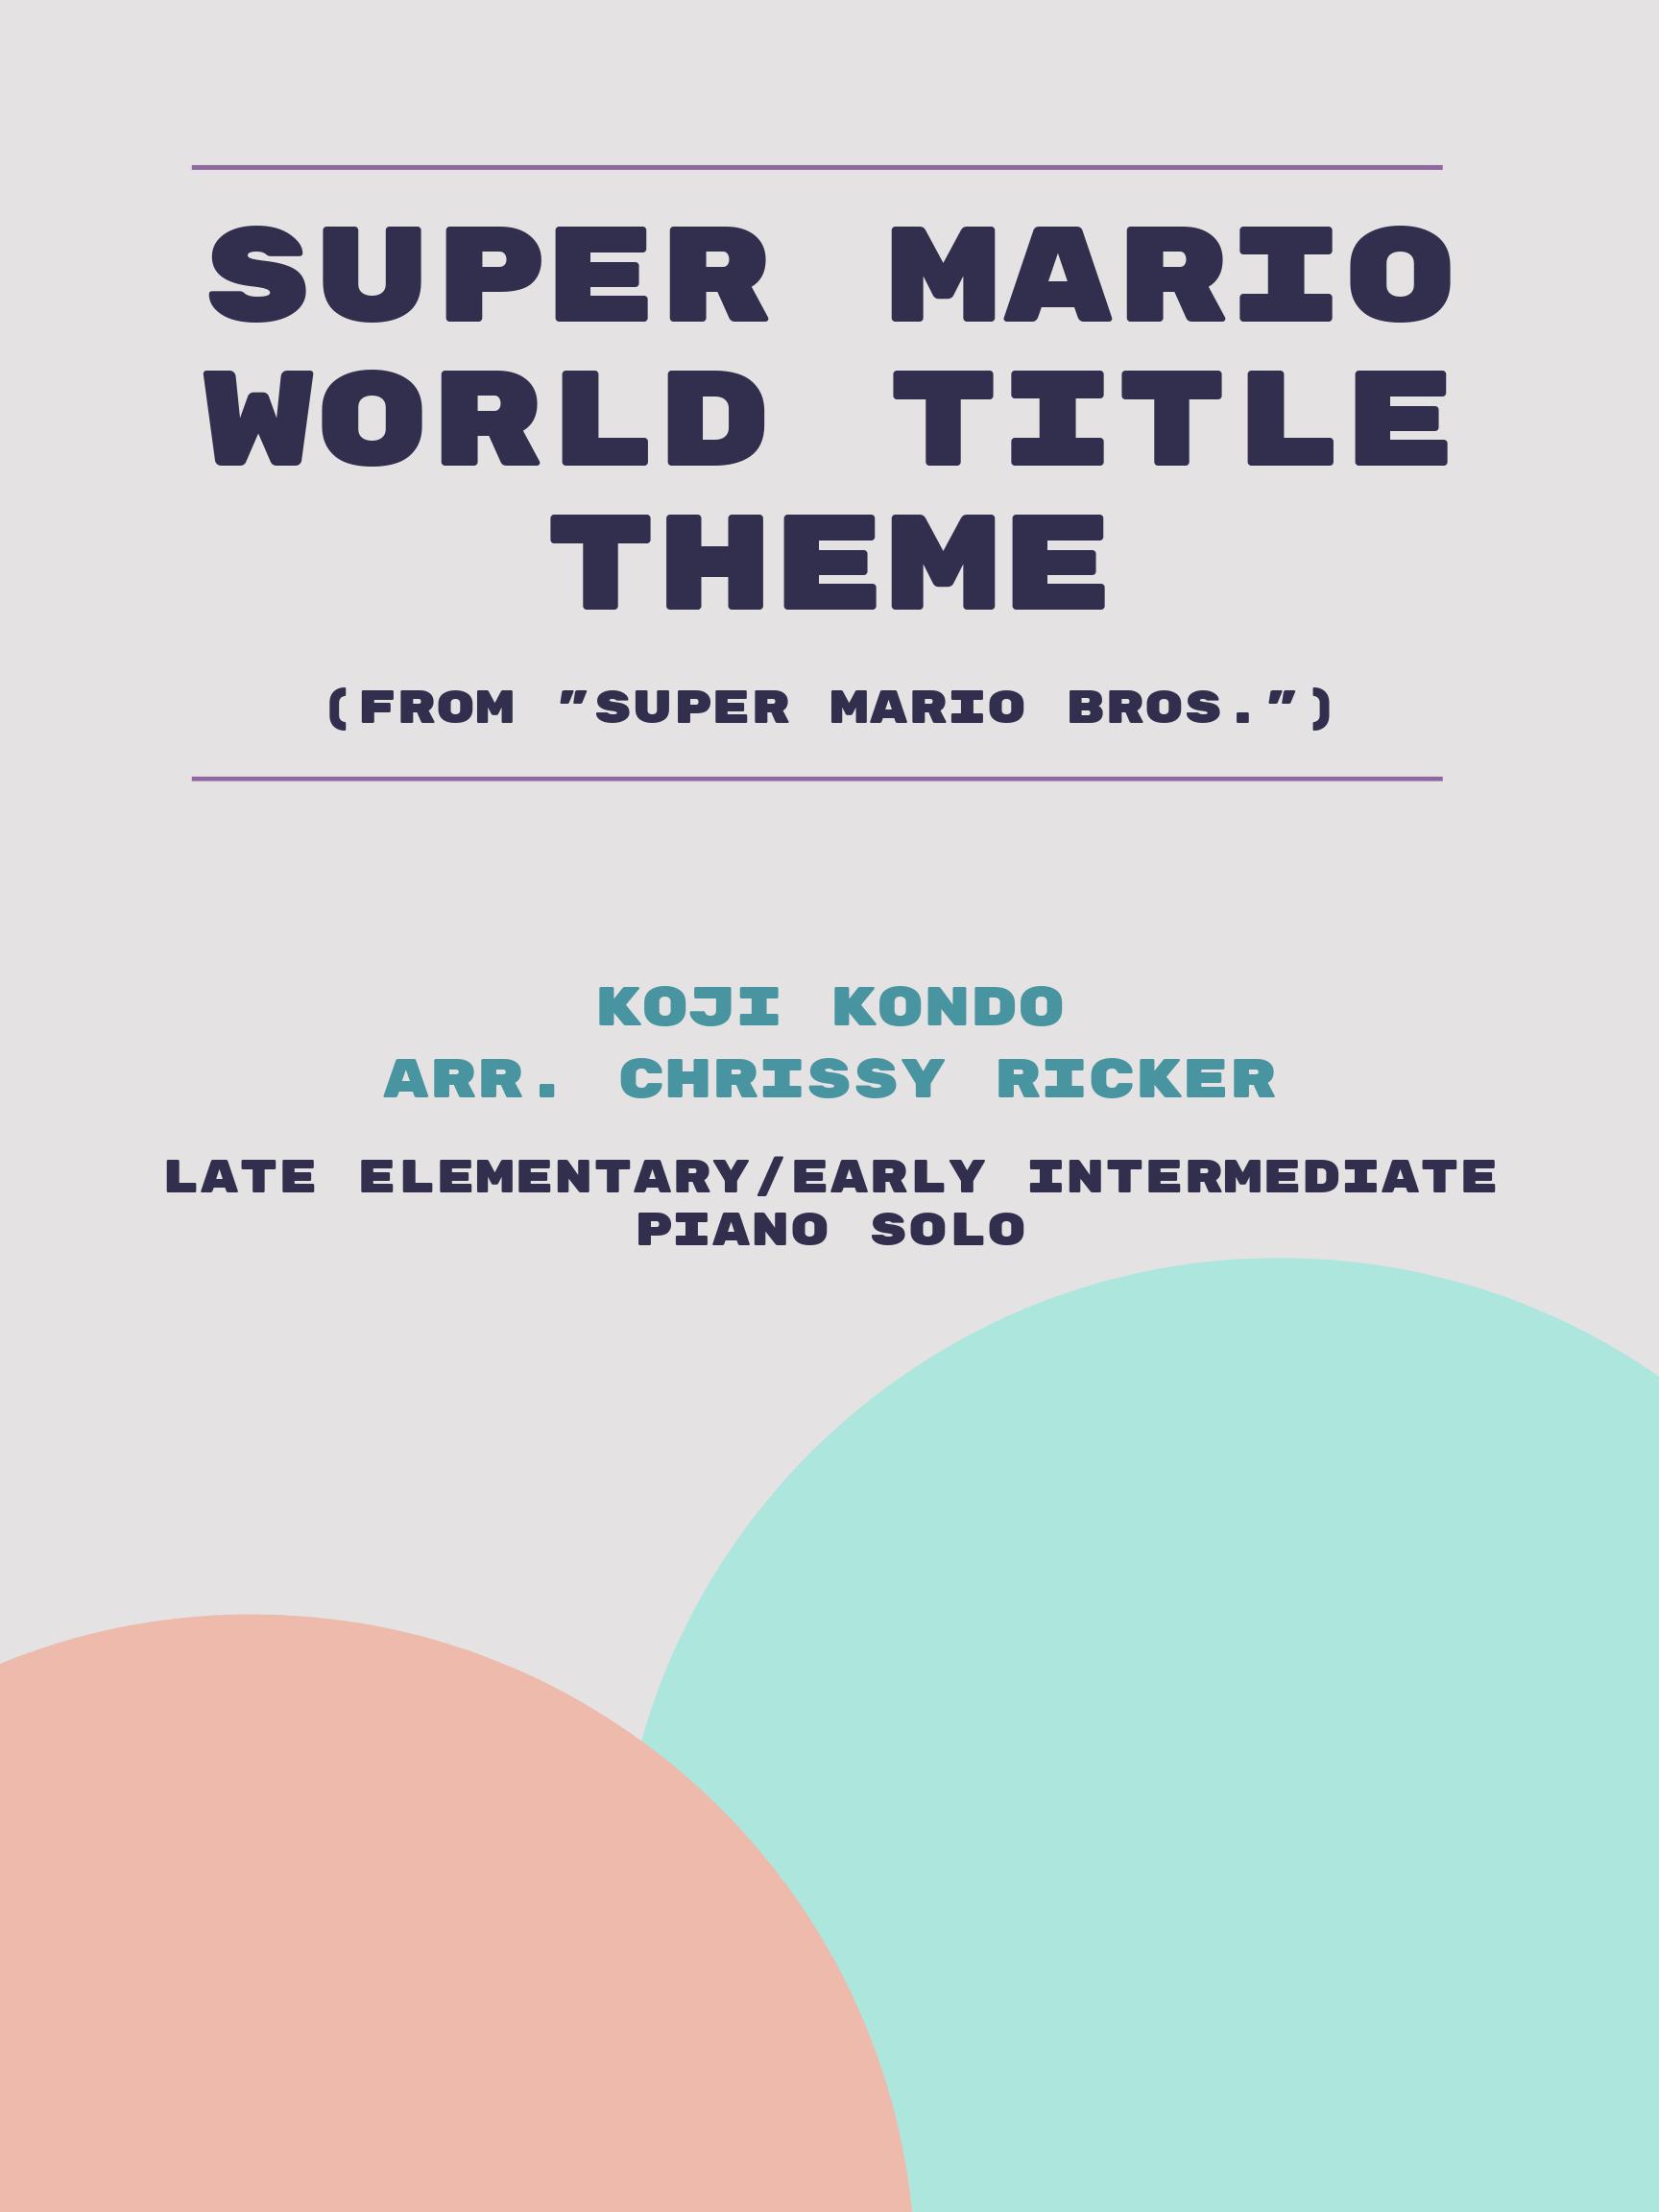 Super Mario World Title Theme by Koji Kondo